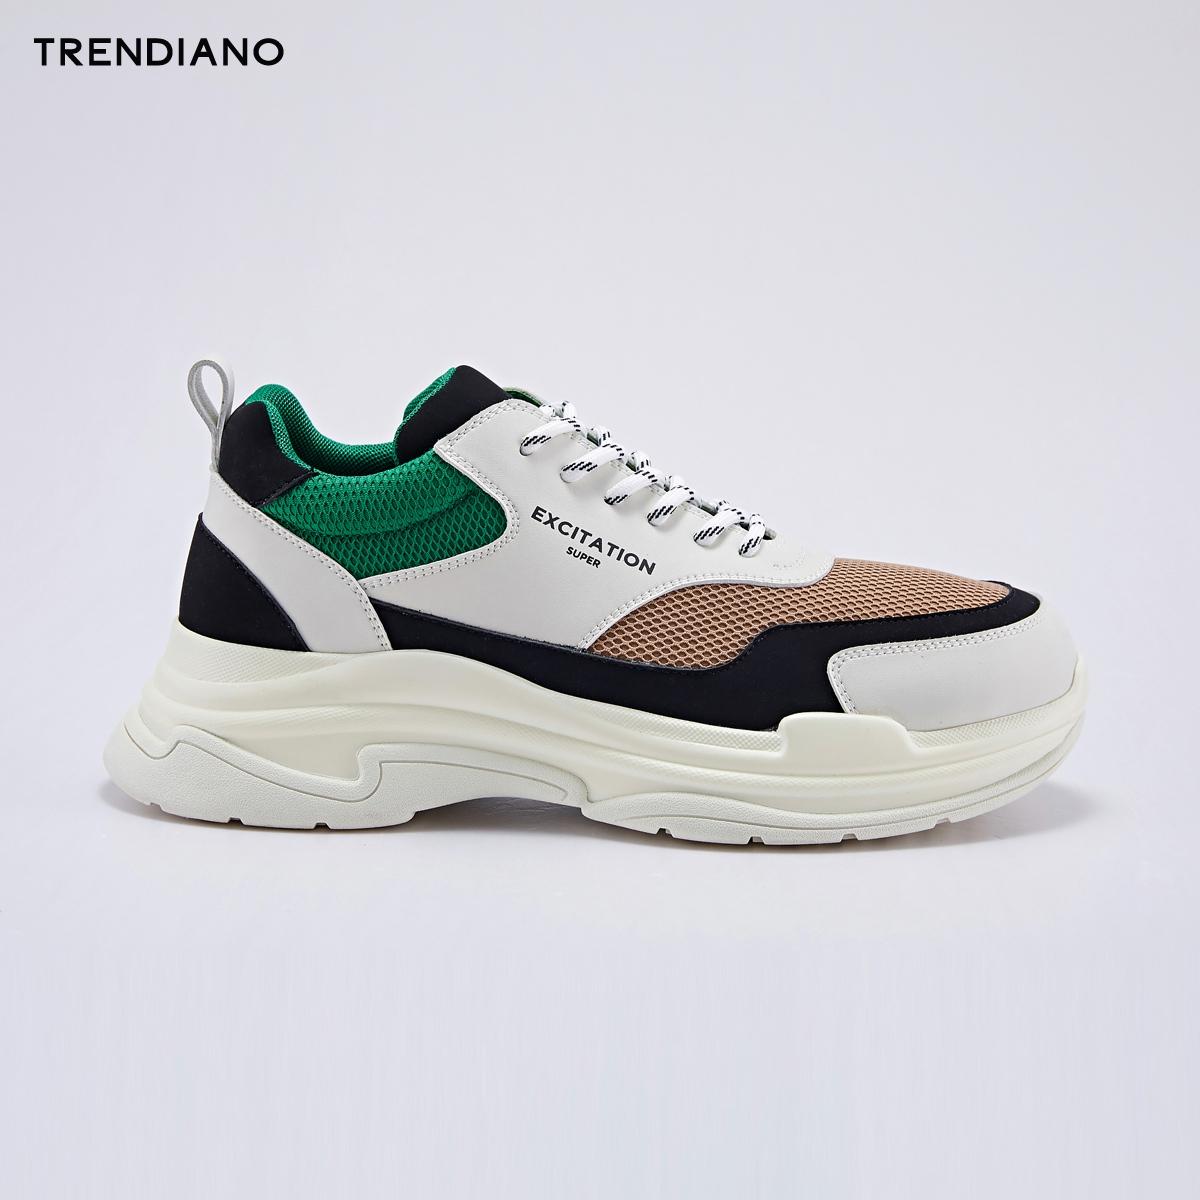 TRENDIANO新2018男装秋装撞色厚底拼接低帮运动老爹鞋3GA351810P